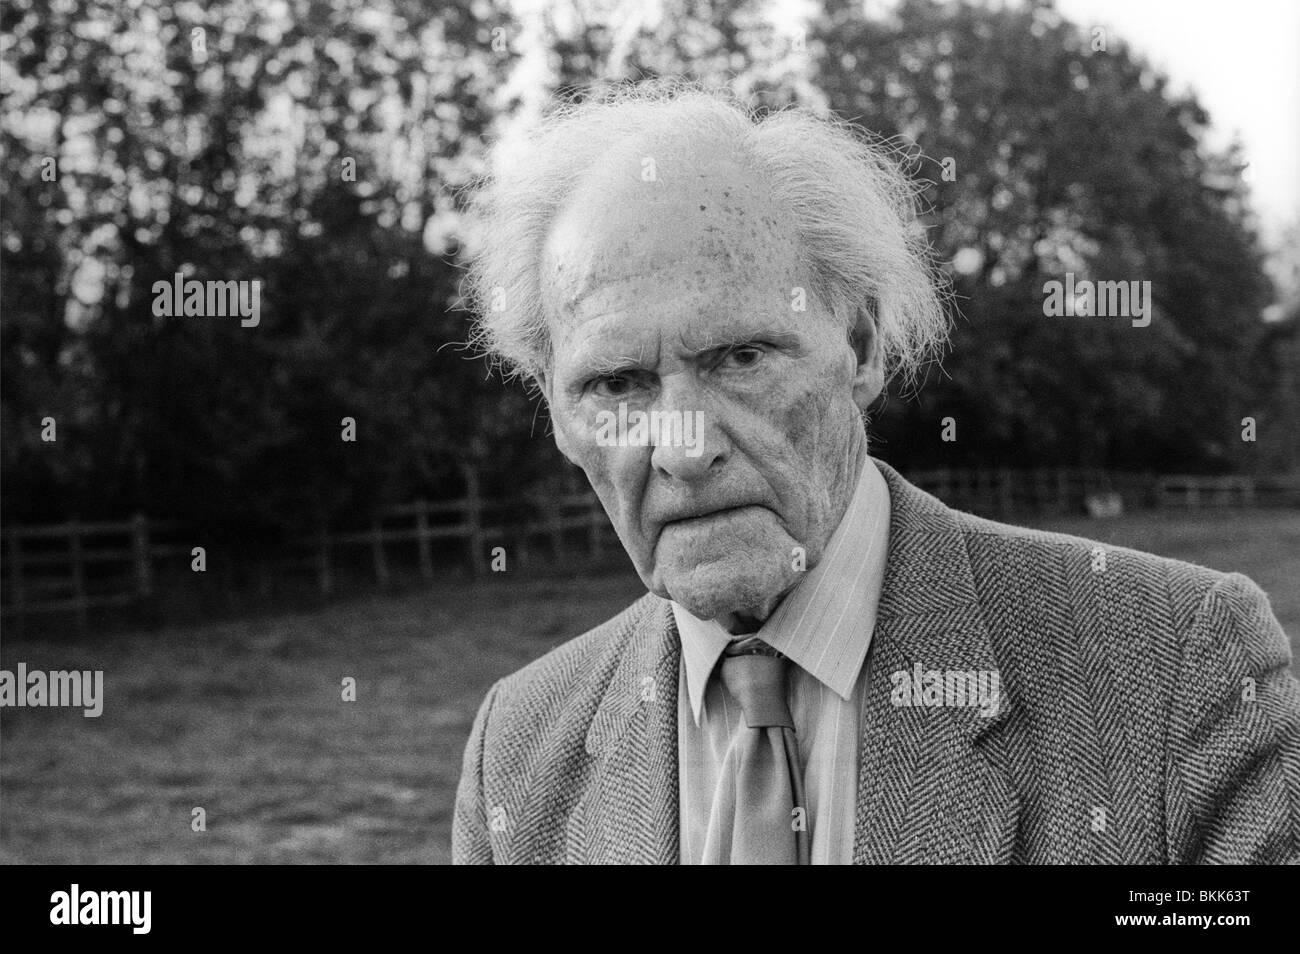 legendary-welsh-english-language-poet-rs-thomas-pictured-at-1992-hay-BKK63T.jpg